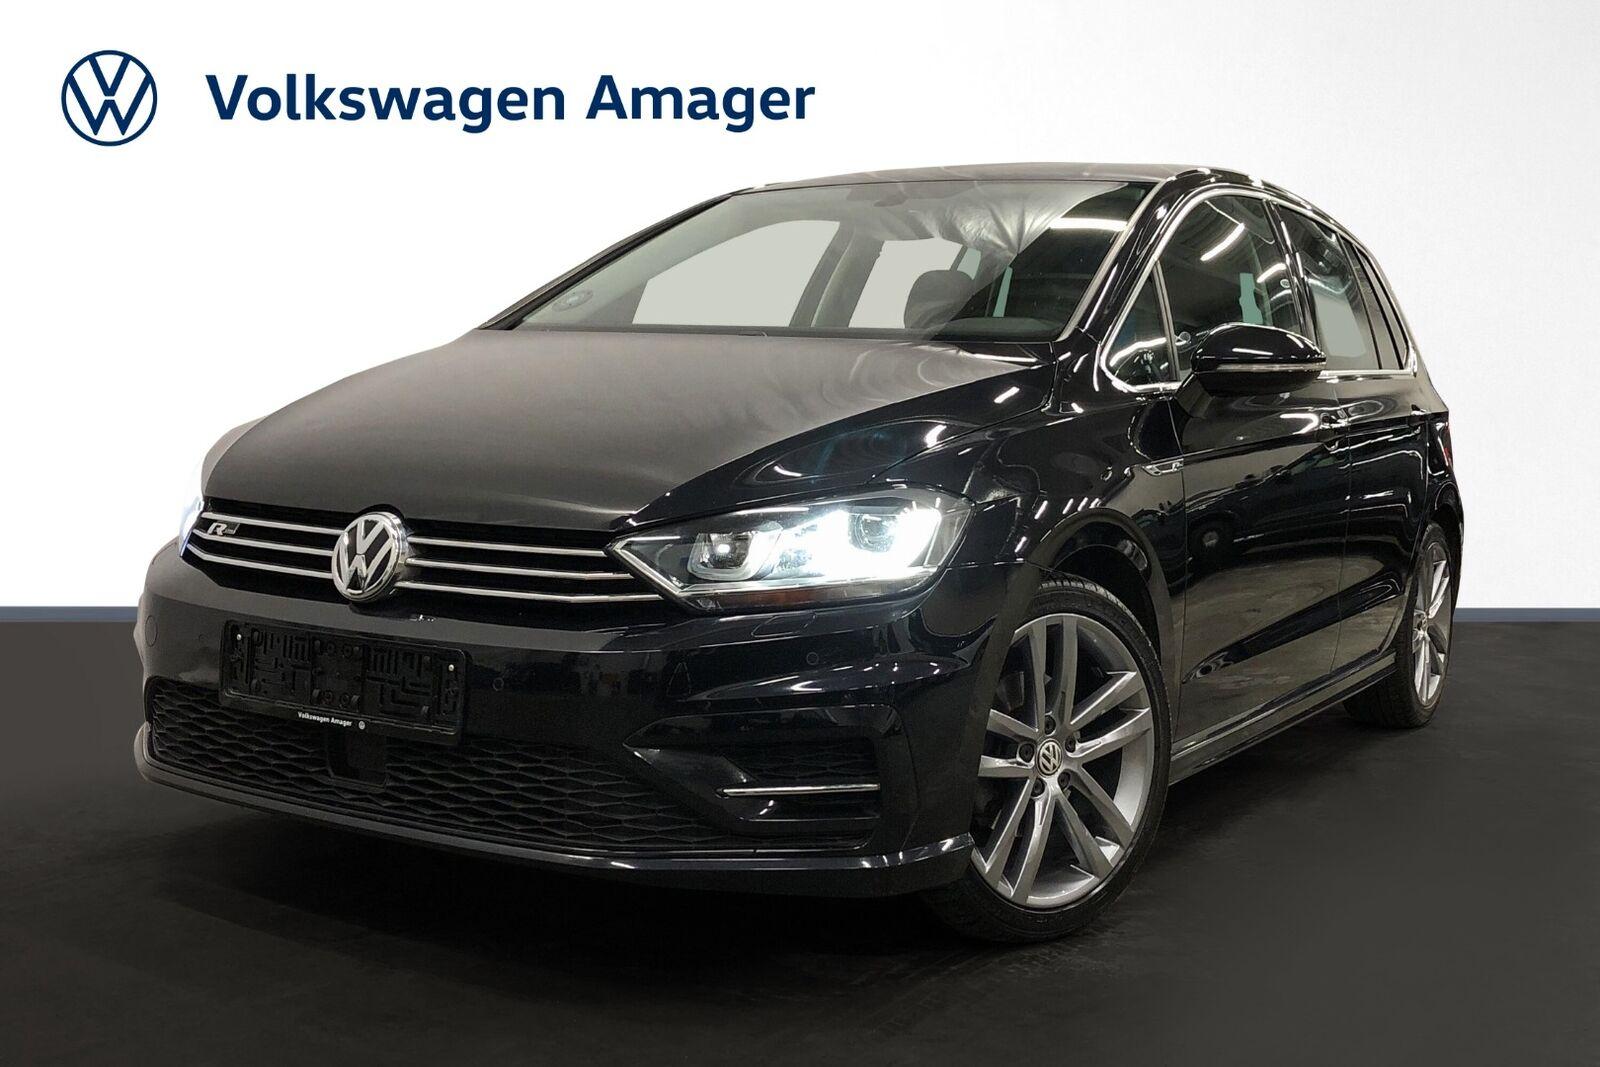 VW Golf Sportsvan 2,0 TDi 150 R-line DSG BMT 5d - 249.900 kr.